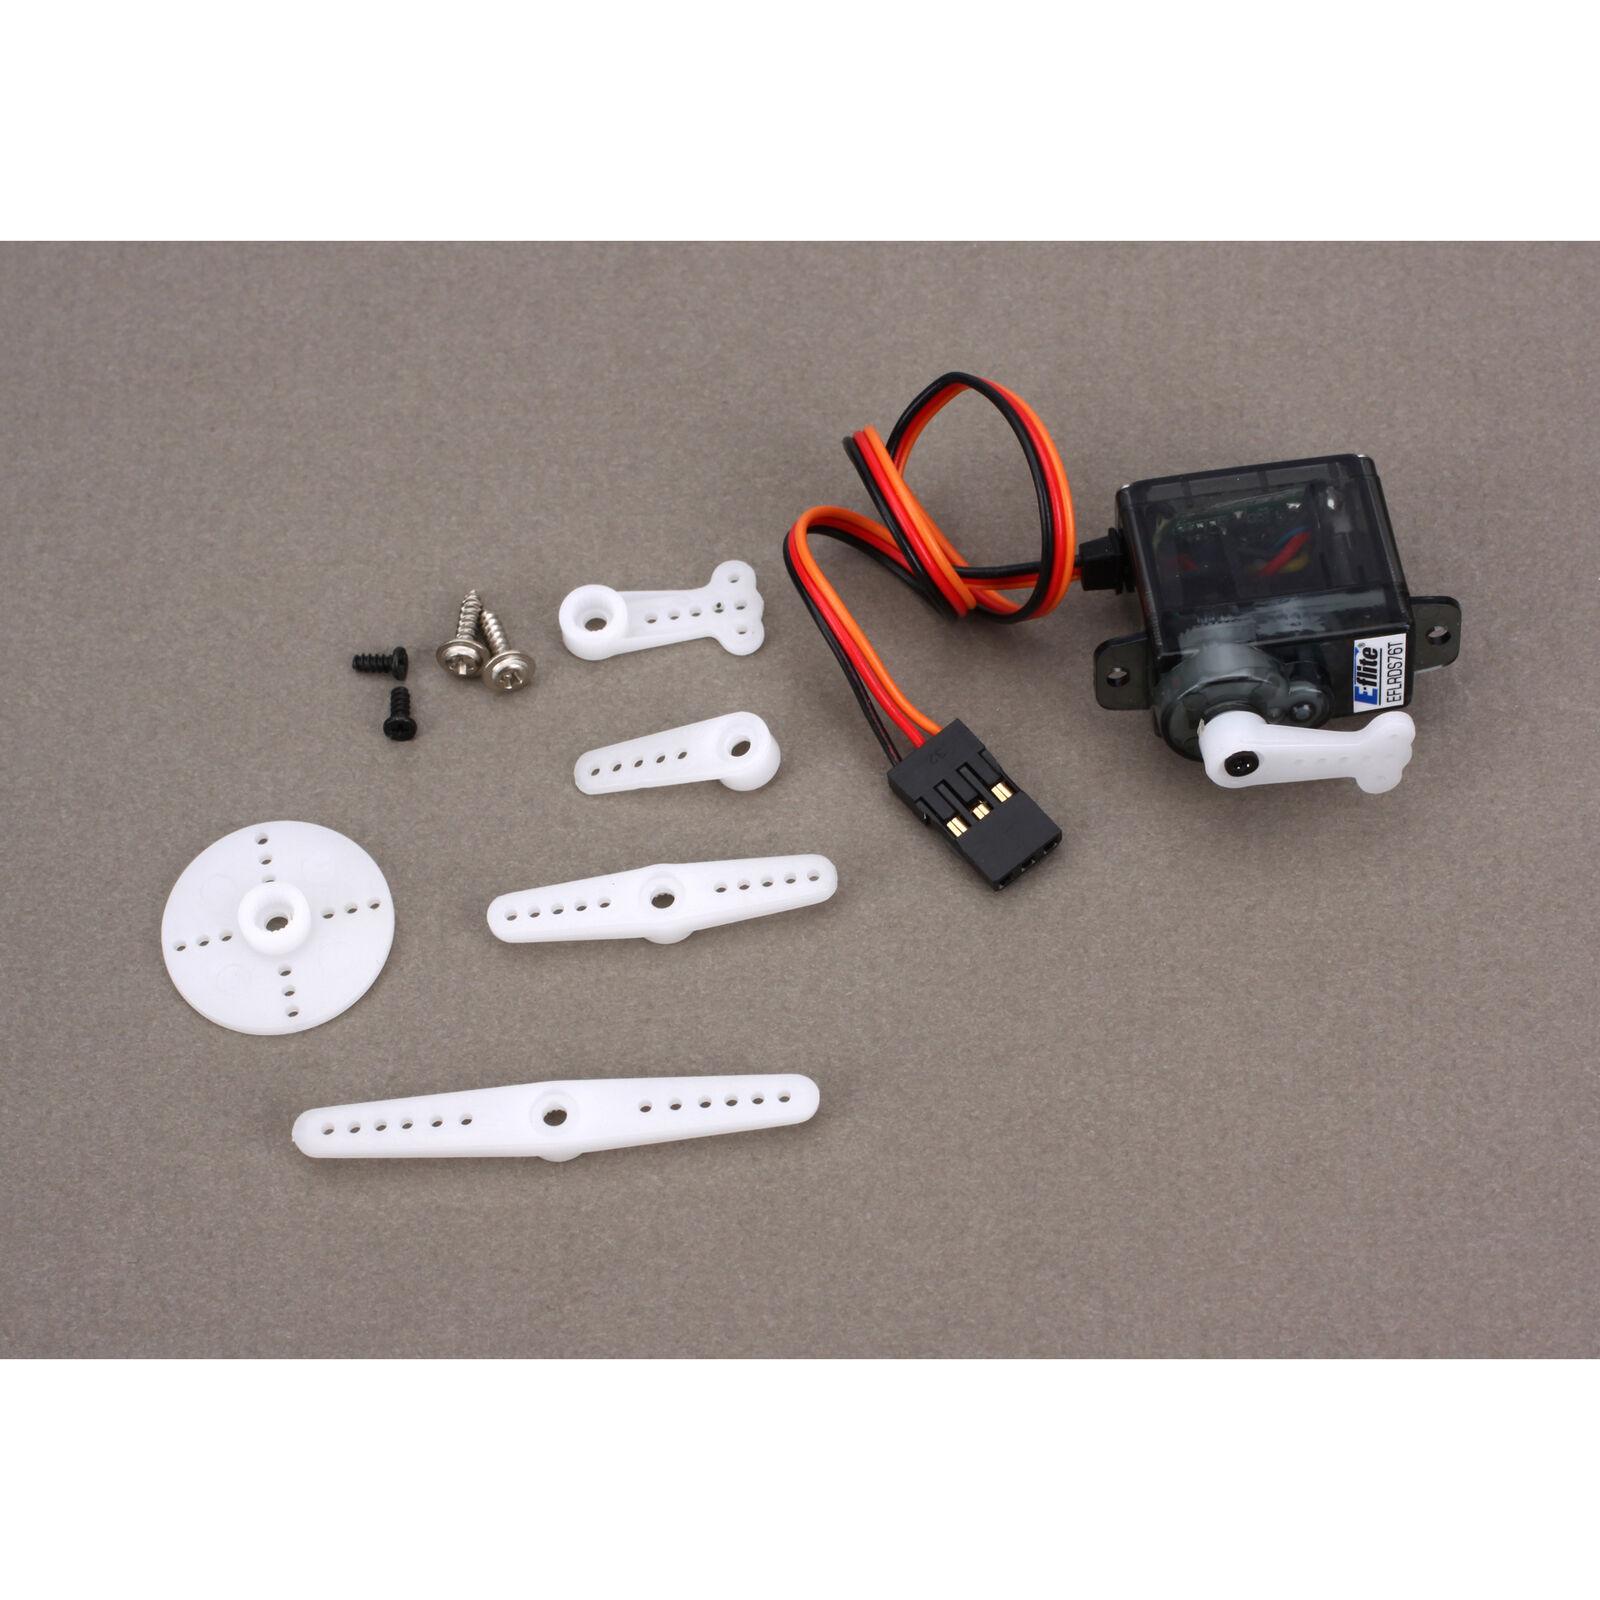 7.6-Gram Sub-Micro Digital Tail Servo